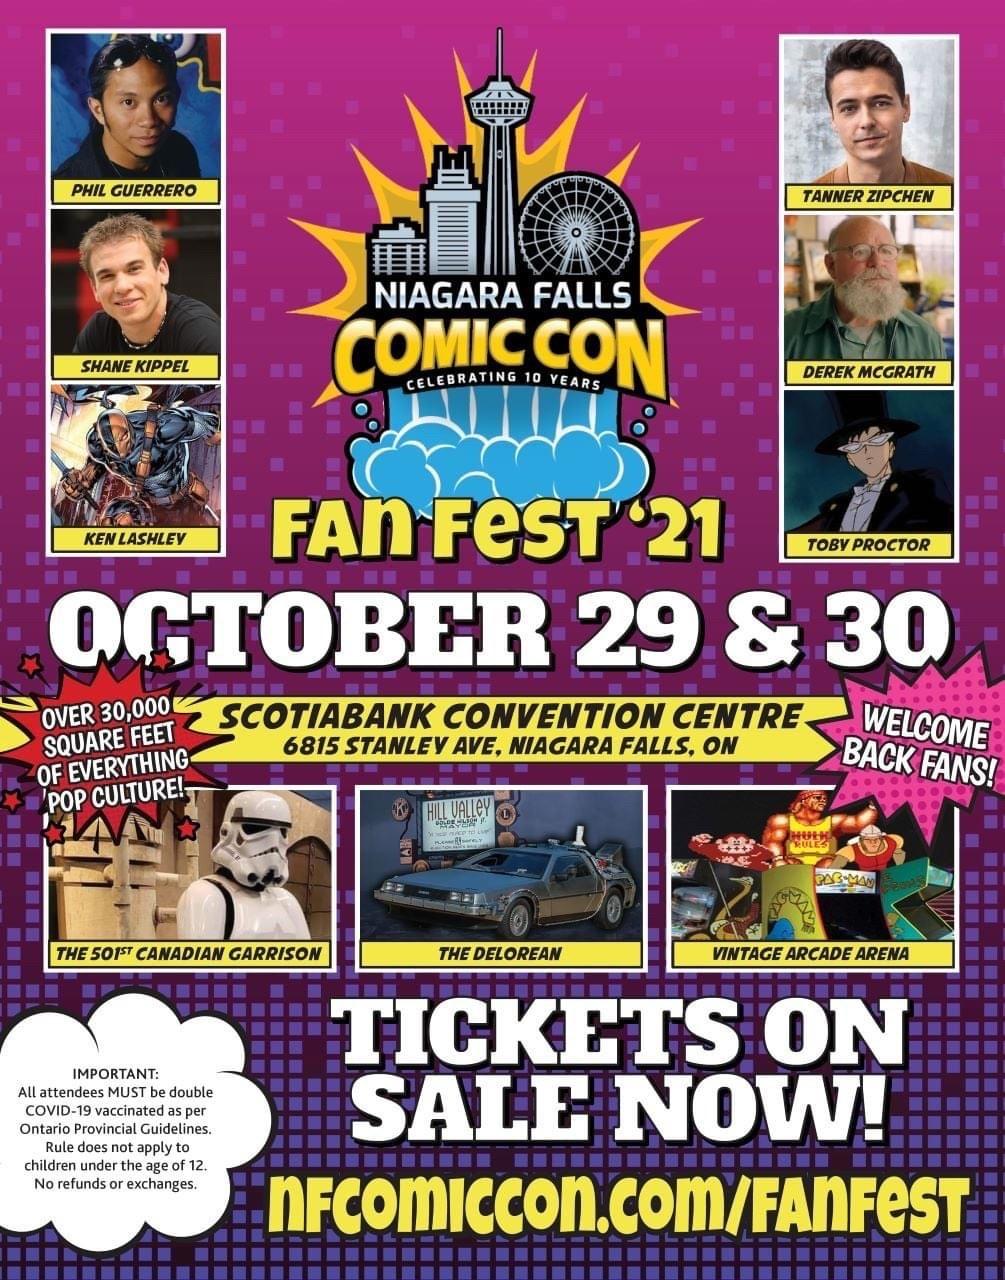 Niagara Falls Comic Con Fan Fest